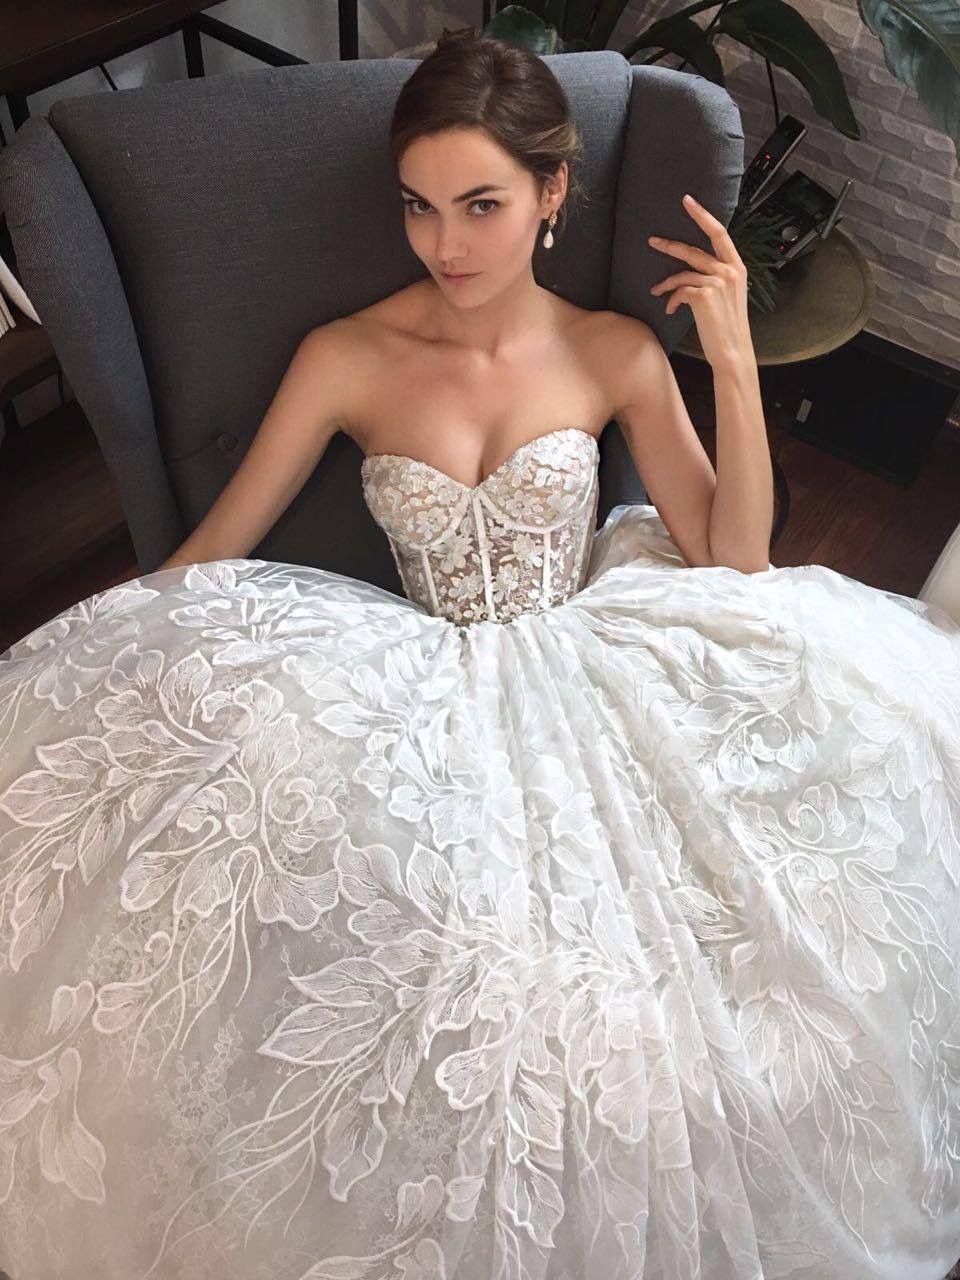 Pin de Joey Barragan en A Wedding dress   Pinterest   Blanco